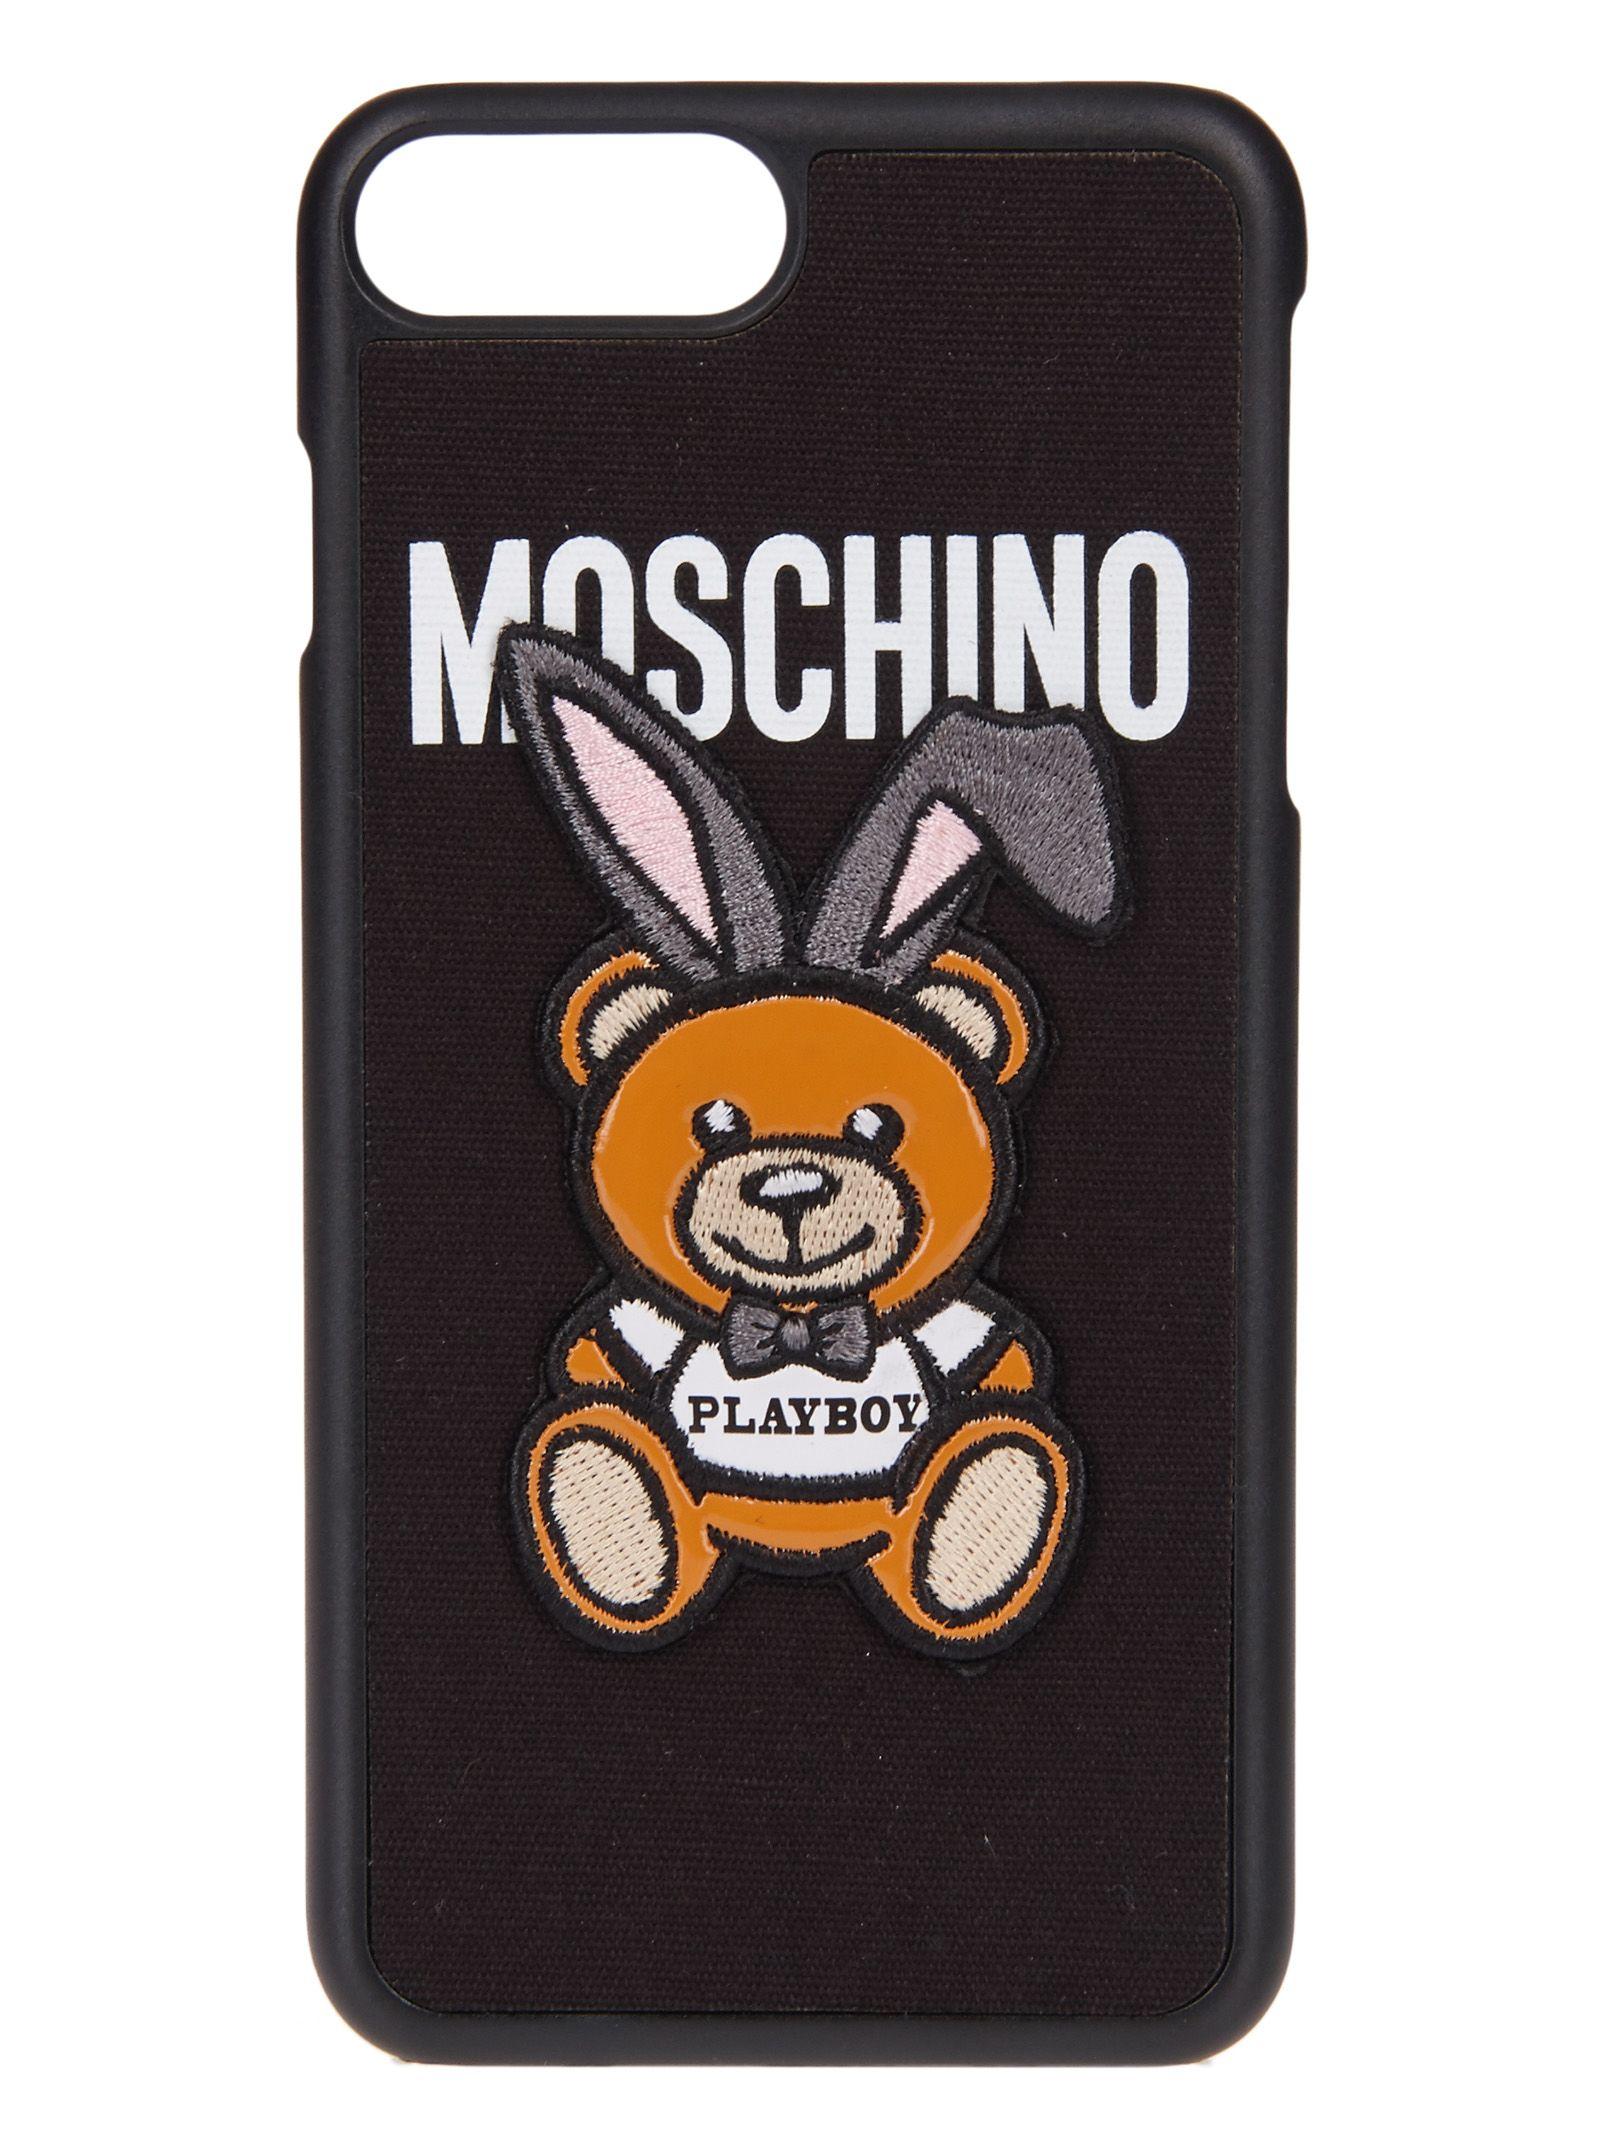 MOSCHINO PLAYBOY IPHONE 7 CASE